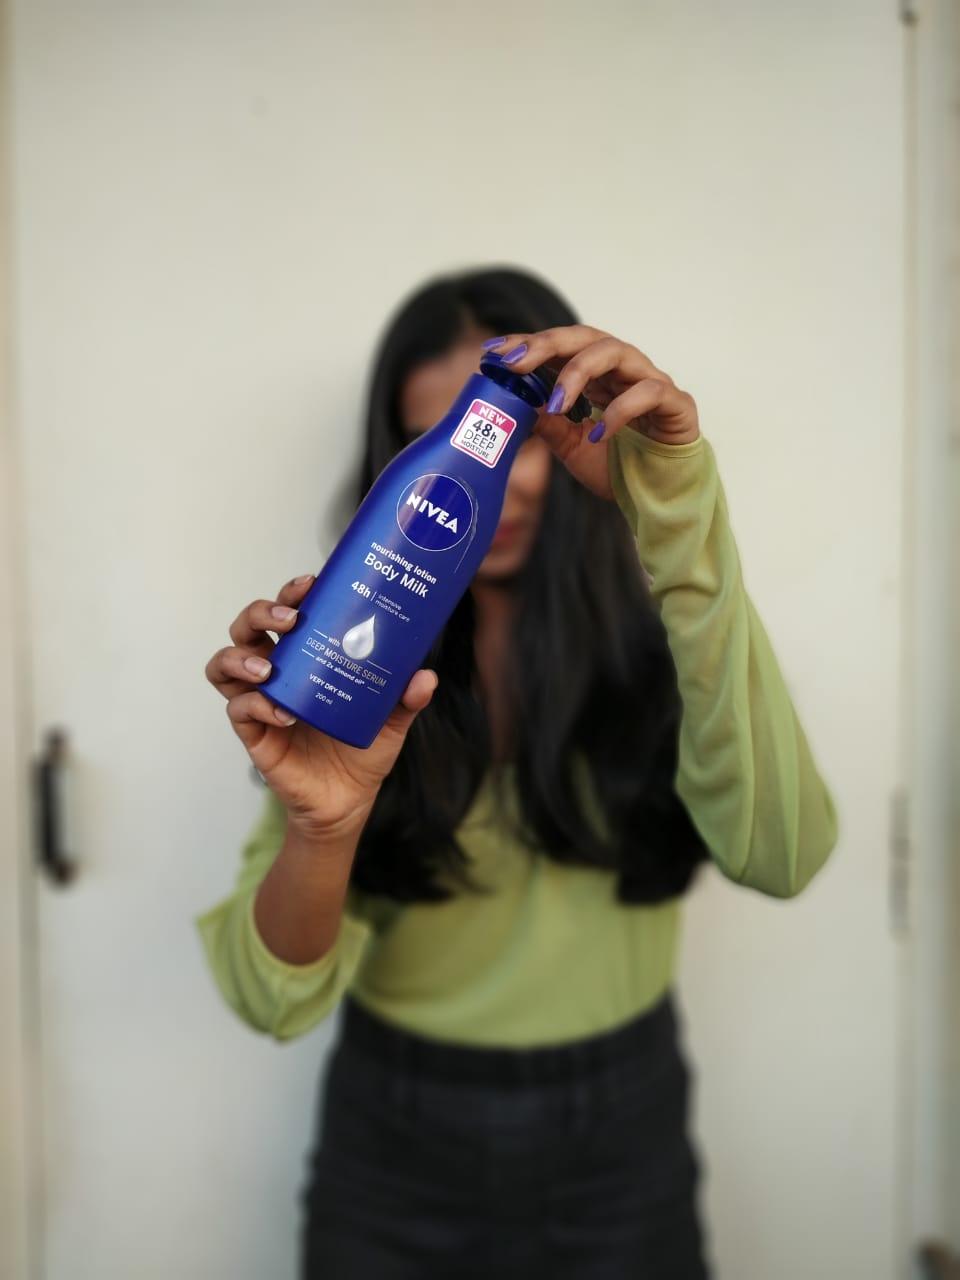 Nivea Nourishing Lotion Body Milk with Deep Moisture Serum-Nivea moisturising lotion-By nidhiprakash12